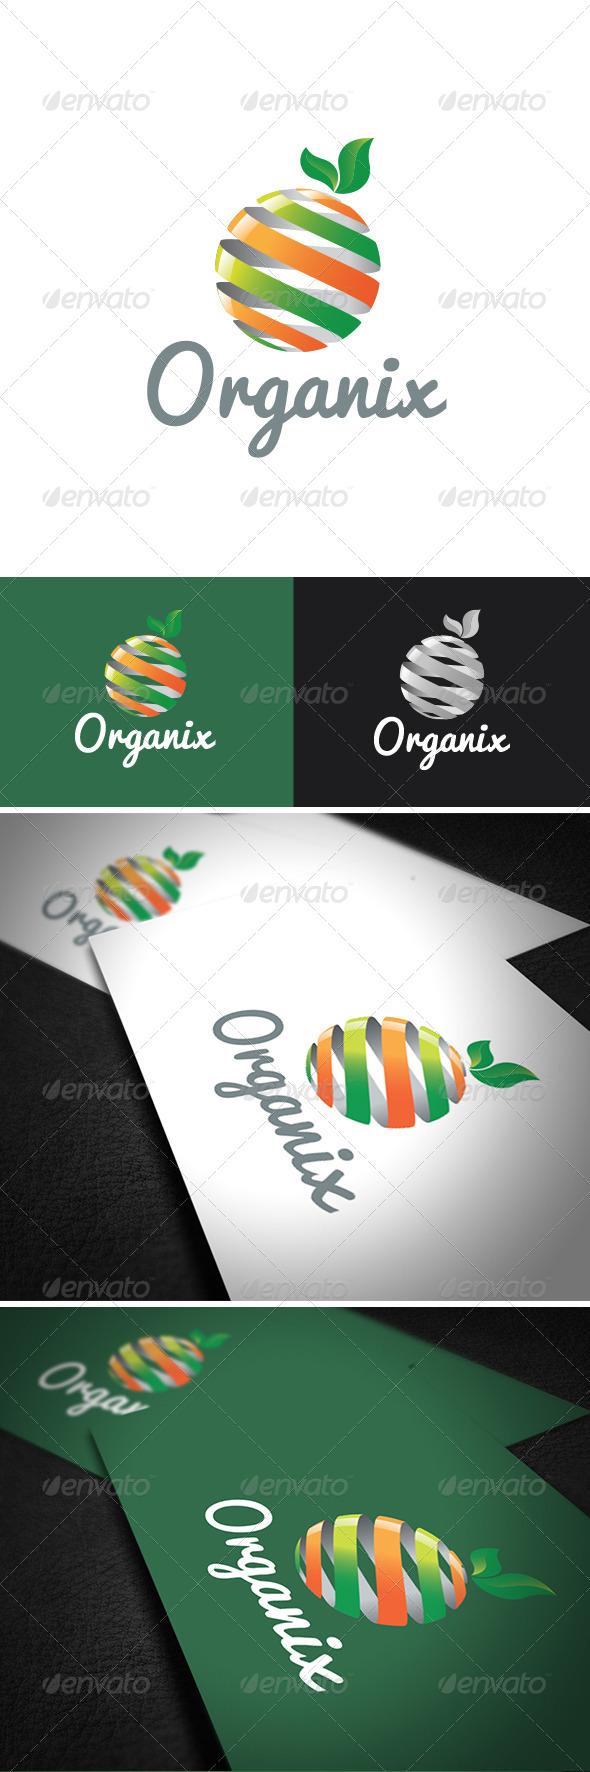 Organix Logo Template